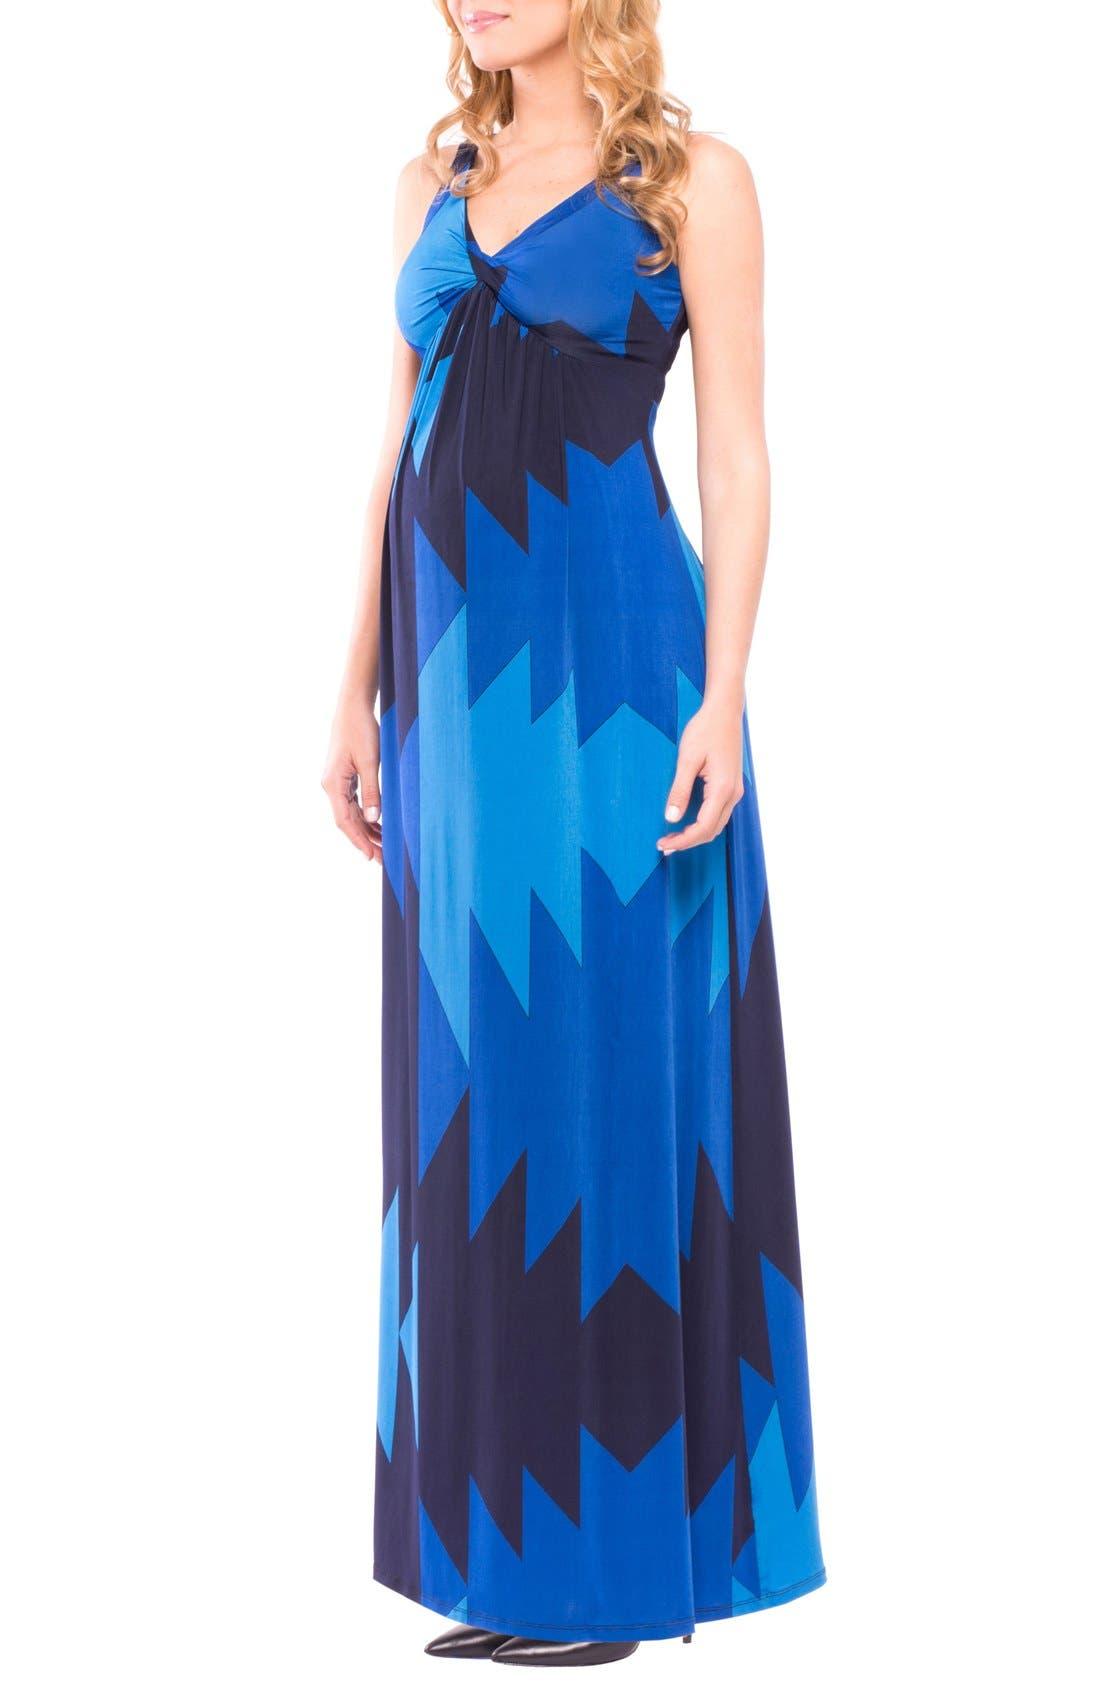 Olivia Sleeveless Maternity Maxi Dress,                             Alternate thumbnail 3, color,                             Blue Aztec Print